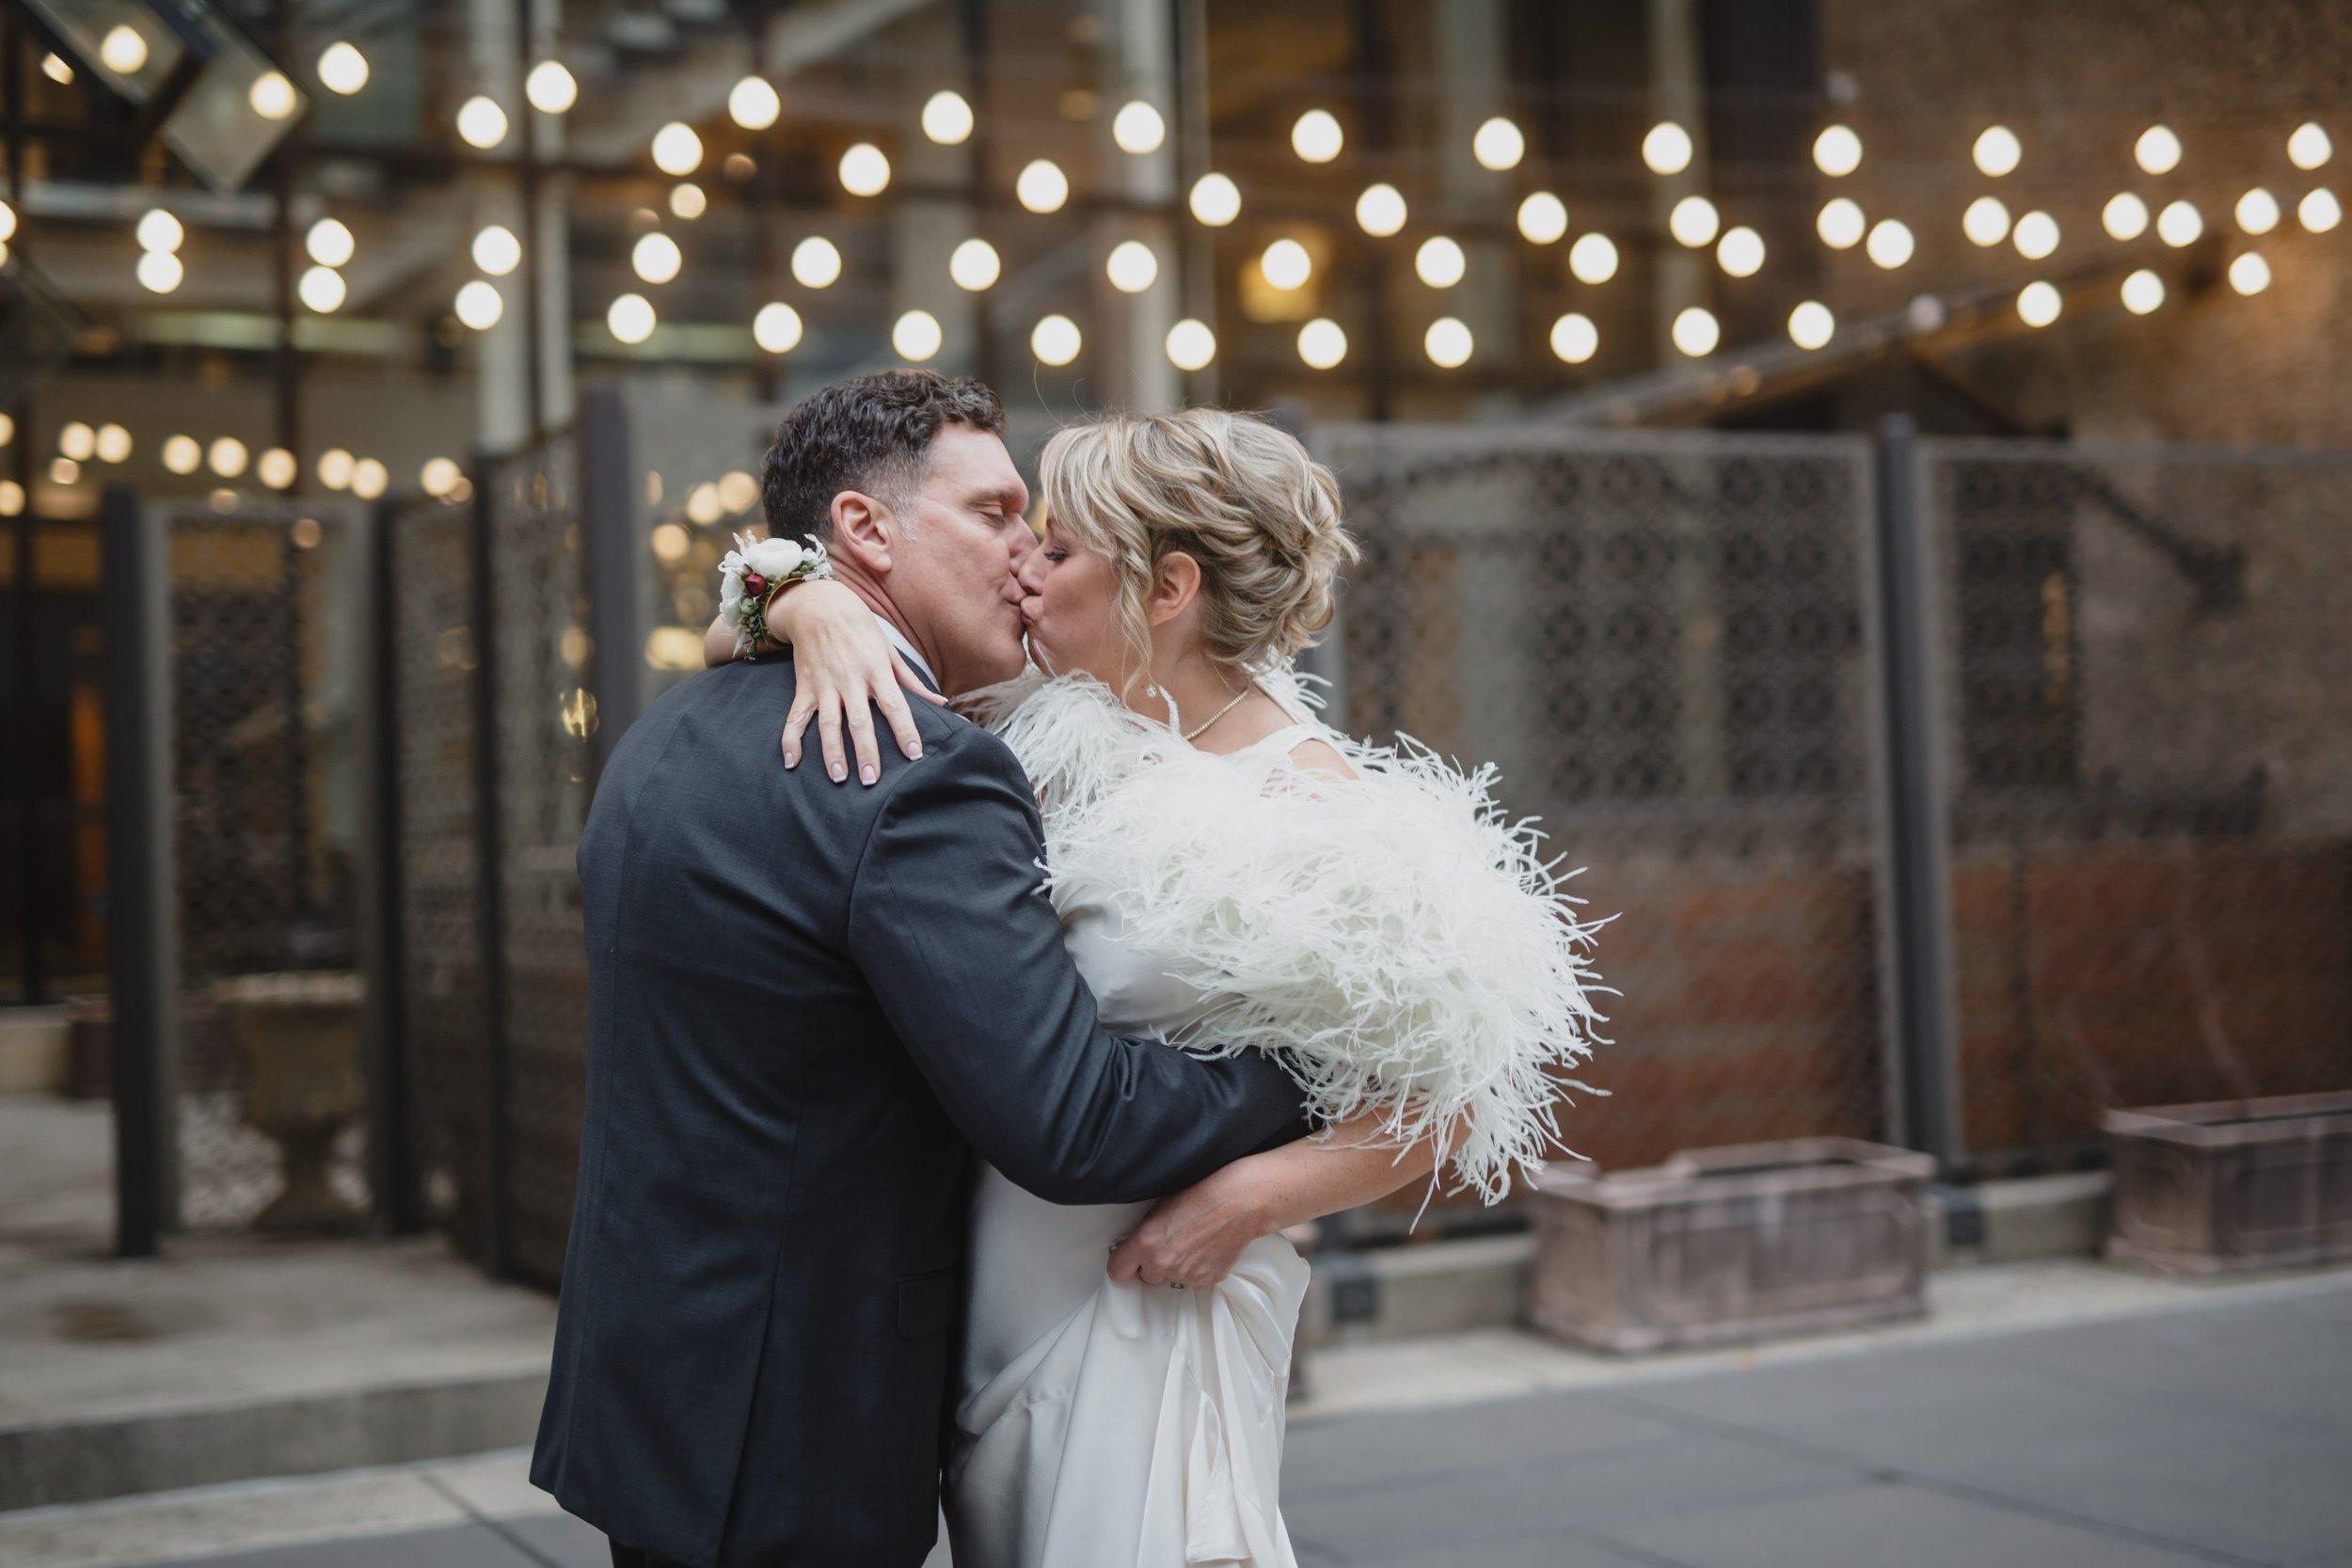 097_Caroline_&_Mike_wedding-min.jpg